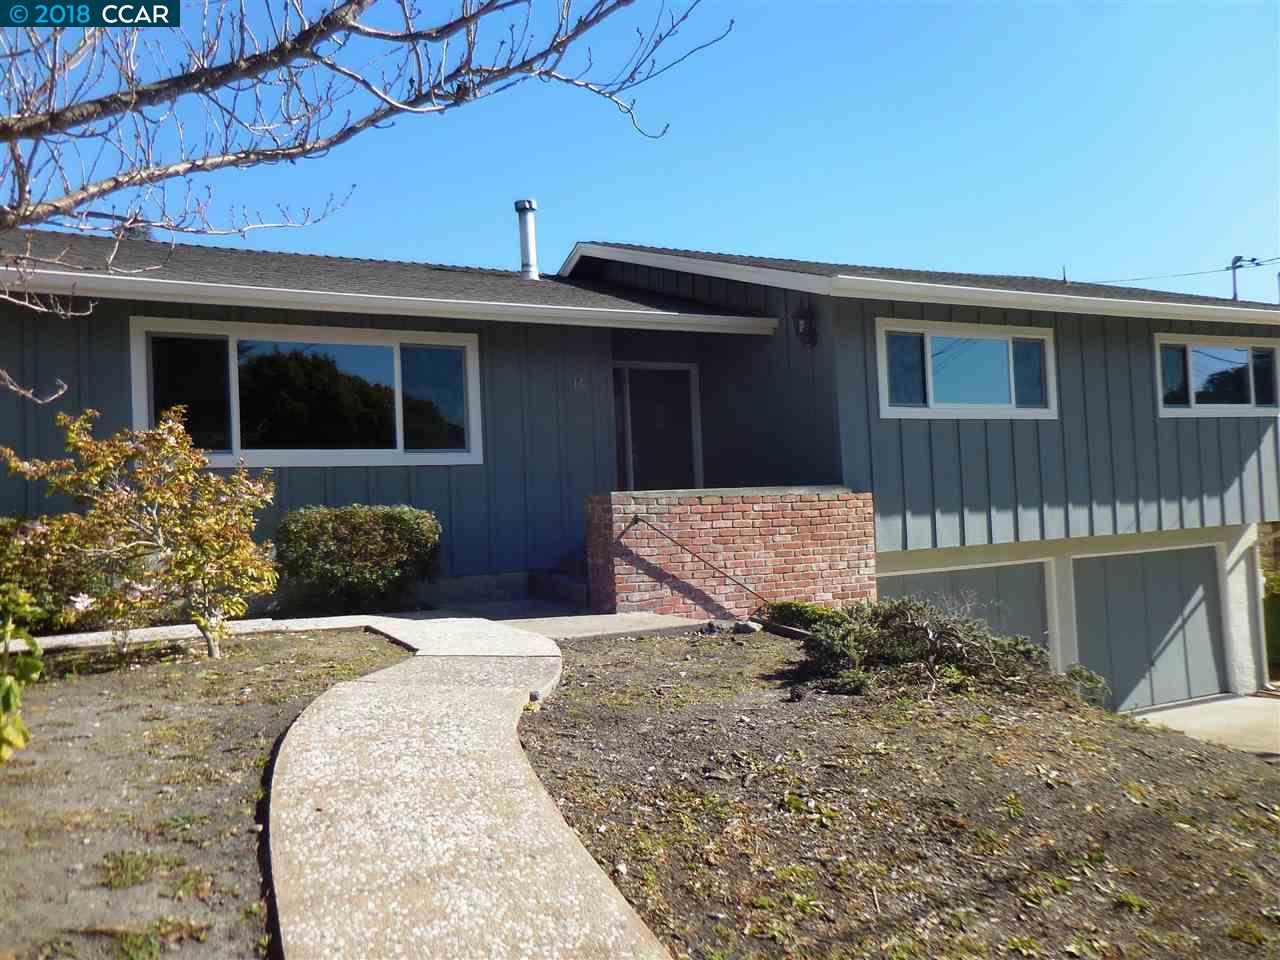 واحد منزل الأسرة للـ Rent في 16 La Honda Court 16 La Honda Court El Sobrante, California 94803 United States